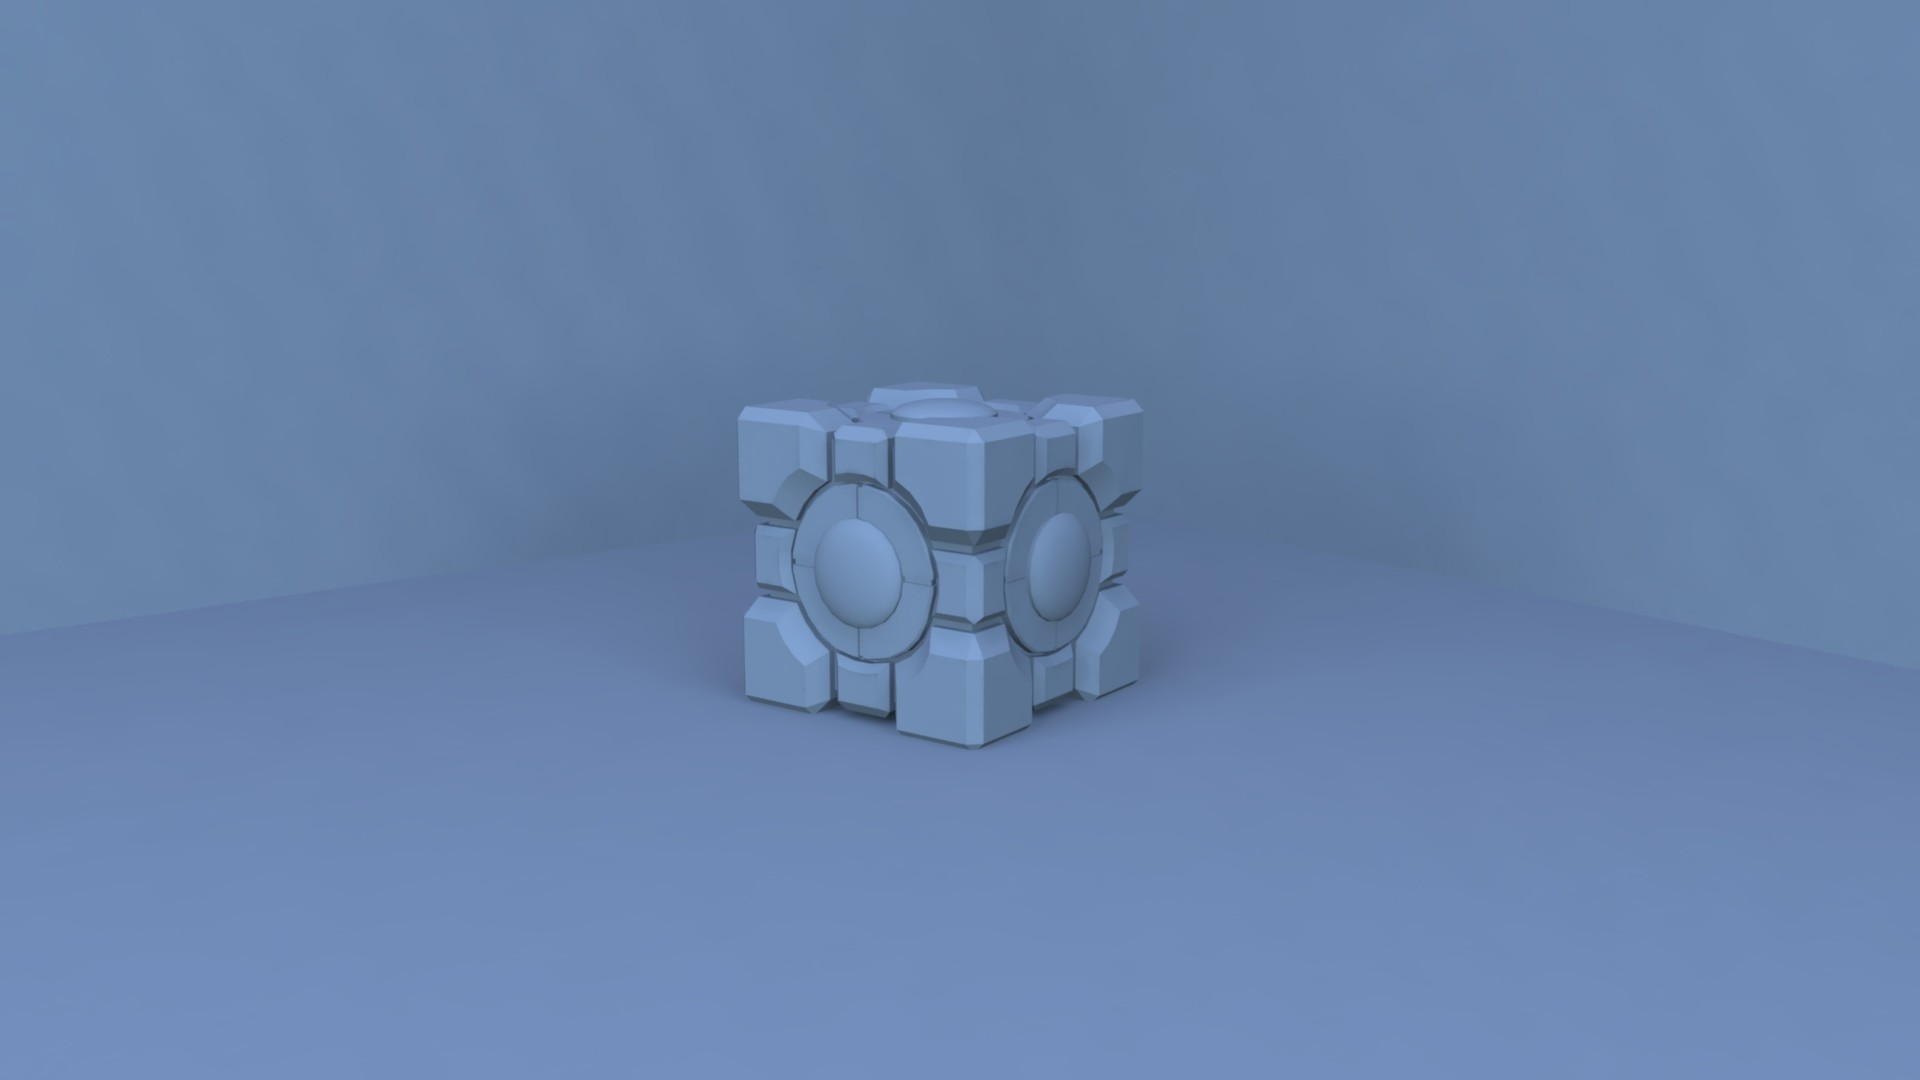 ArtStation - Lighting/Rendering Experiment using Companion Cube